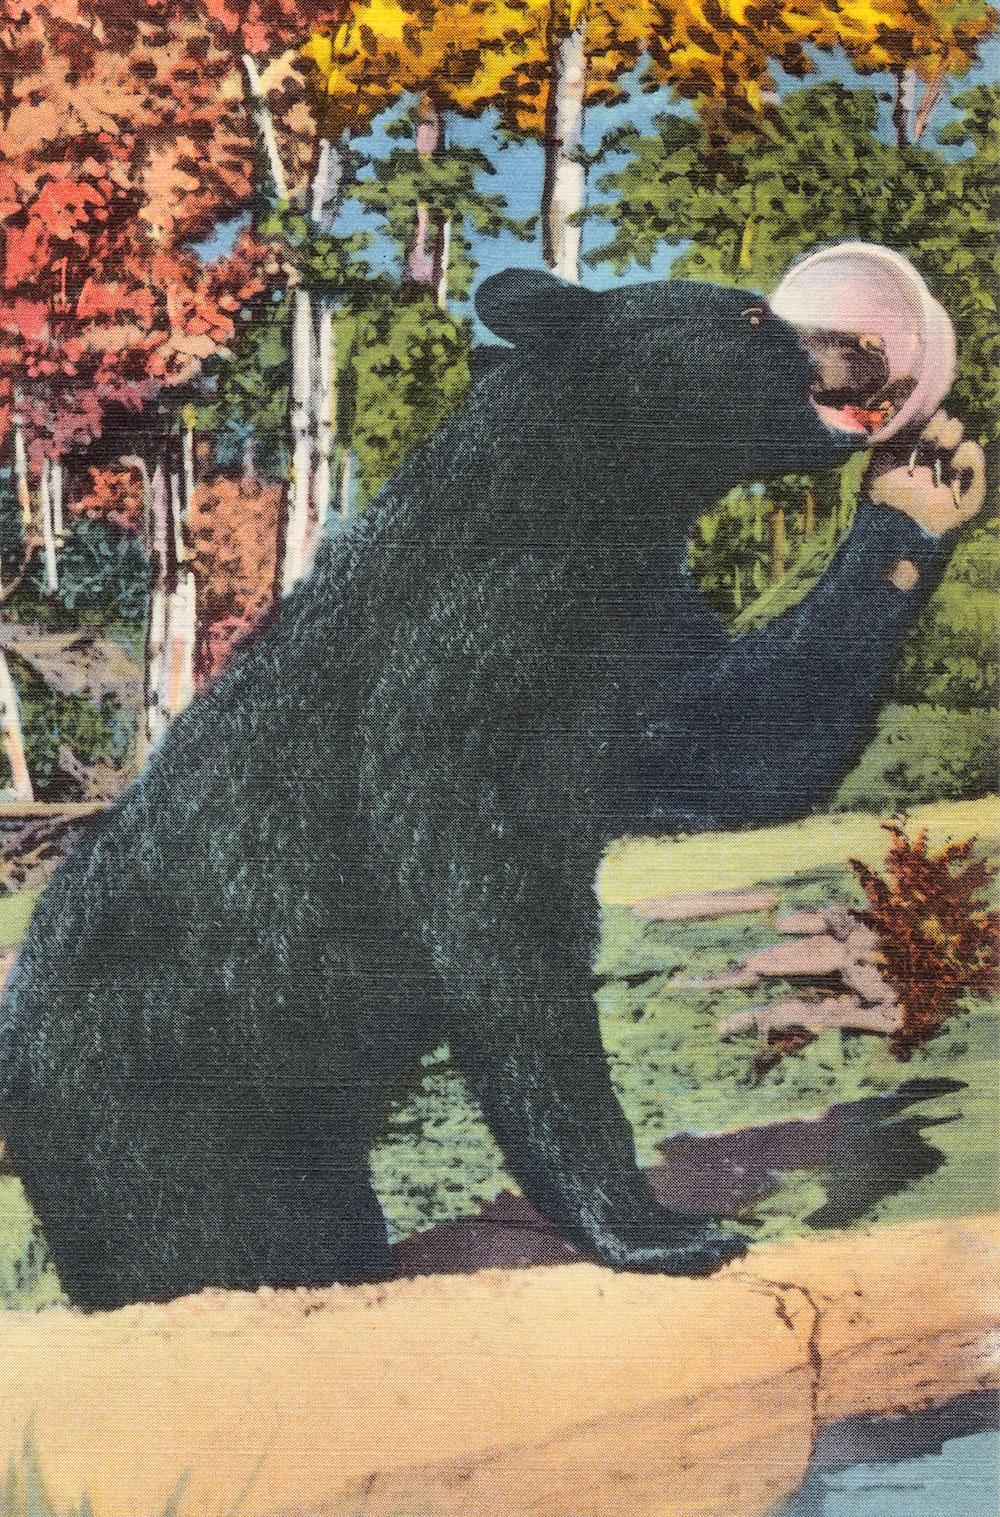 black bear on green grass field during daytime